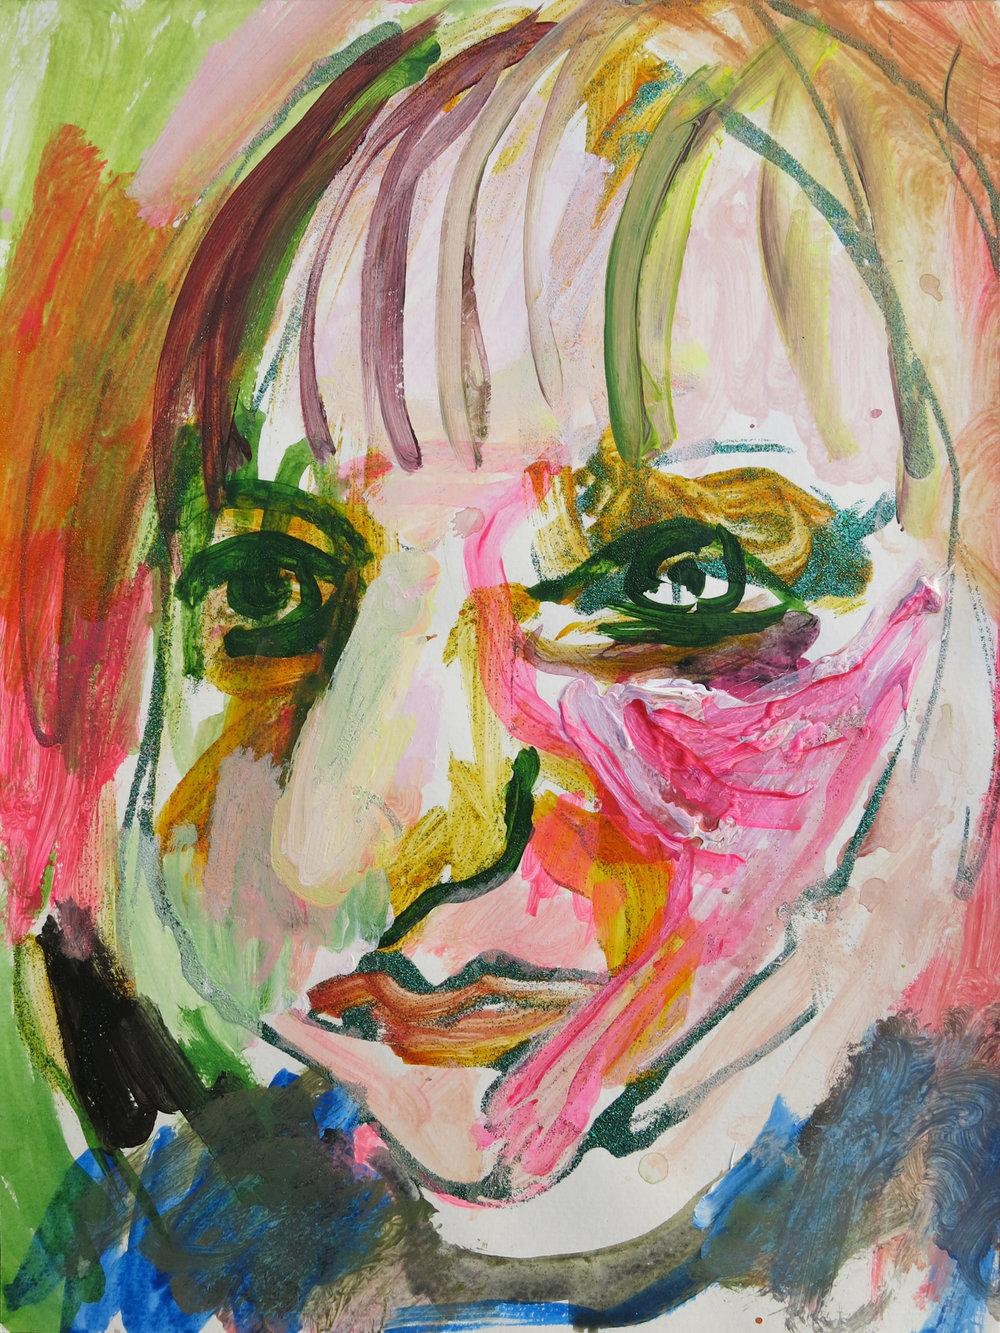 Barbra Streisand Portrait #11